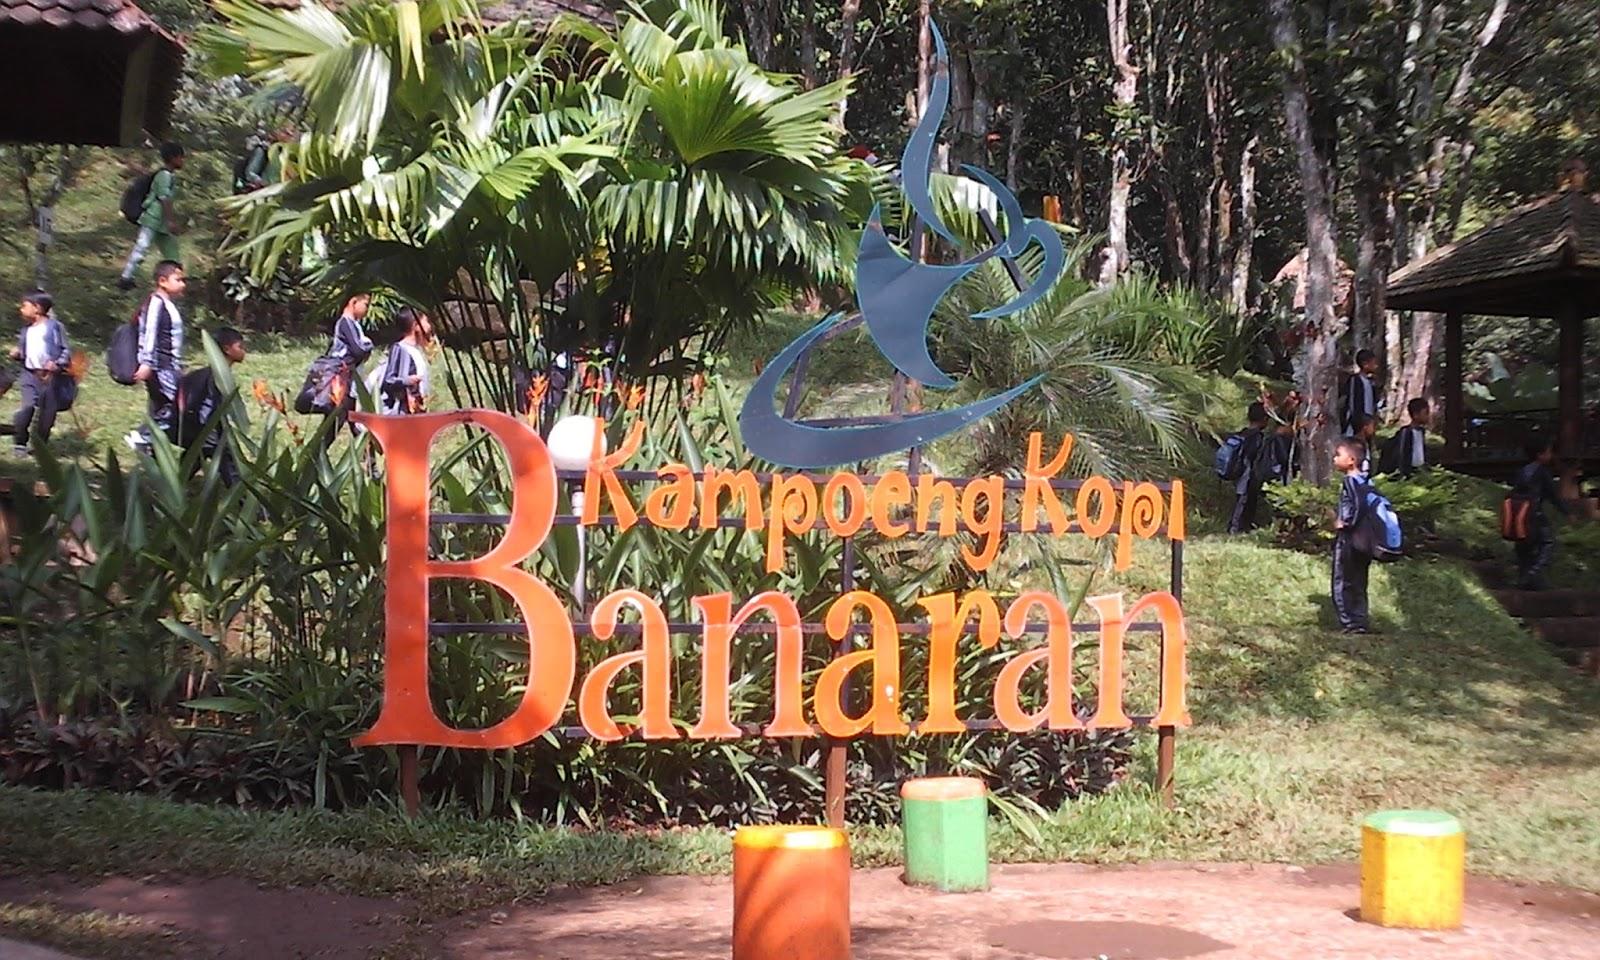 Wisata Kampoeng Kopi Banaran Semarang Kota Kampoen Terletak Wilayah Kabupaten